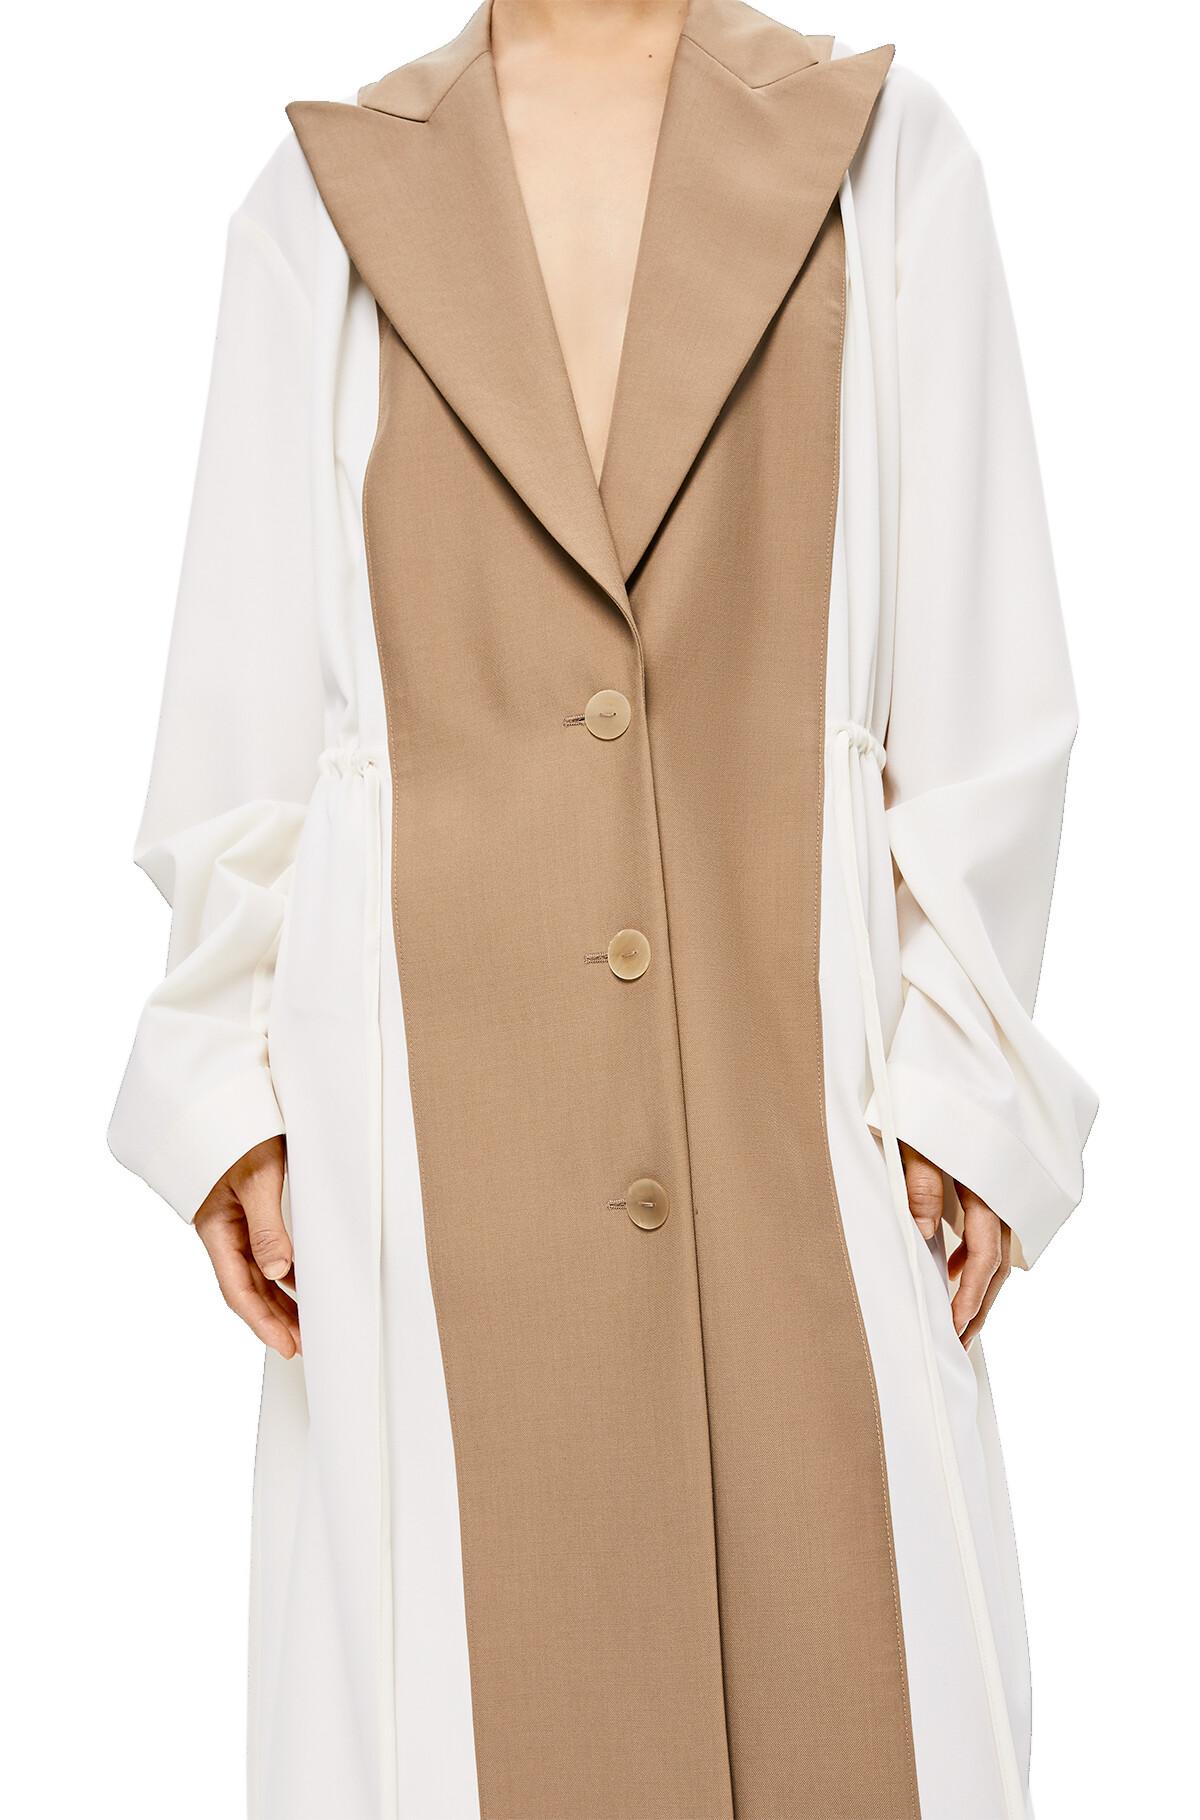 LOEWE Peak Lapel Bimaterial Coat White/Beige front